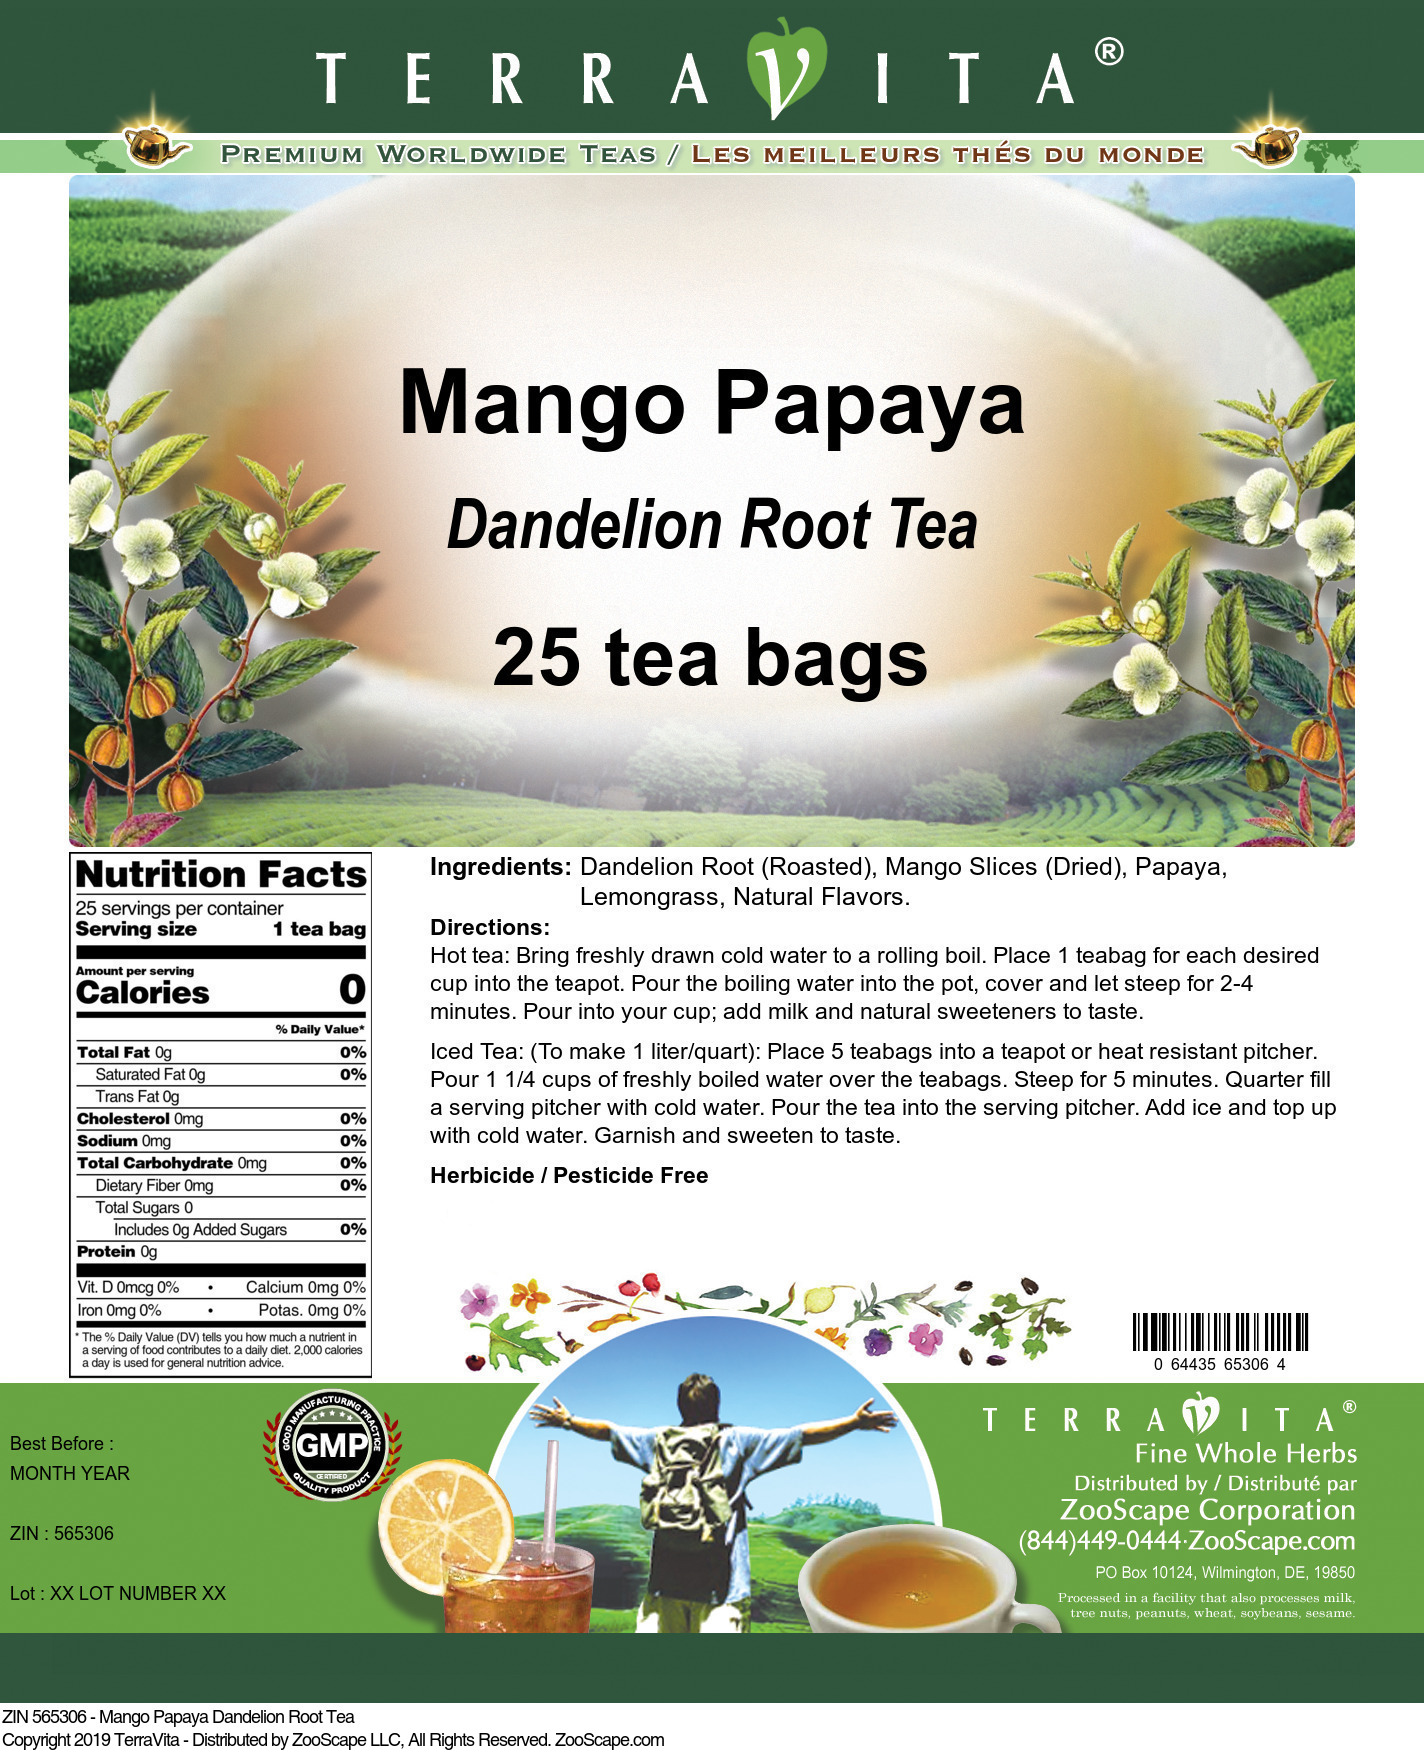 Mango Papaya Dandelion Root Tea